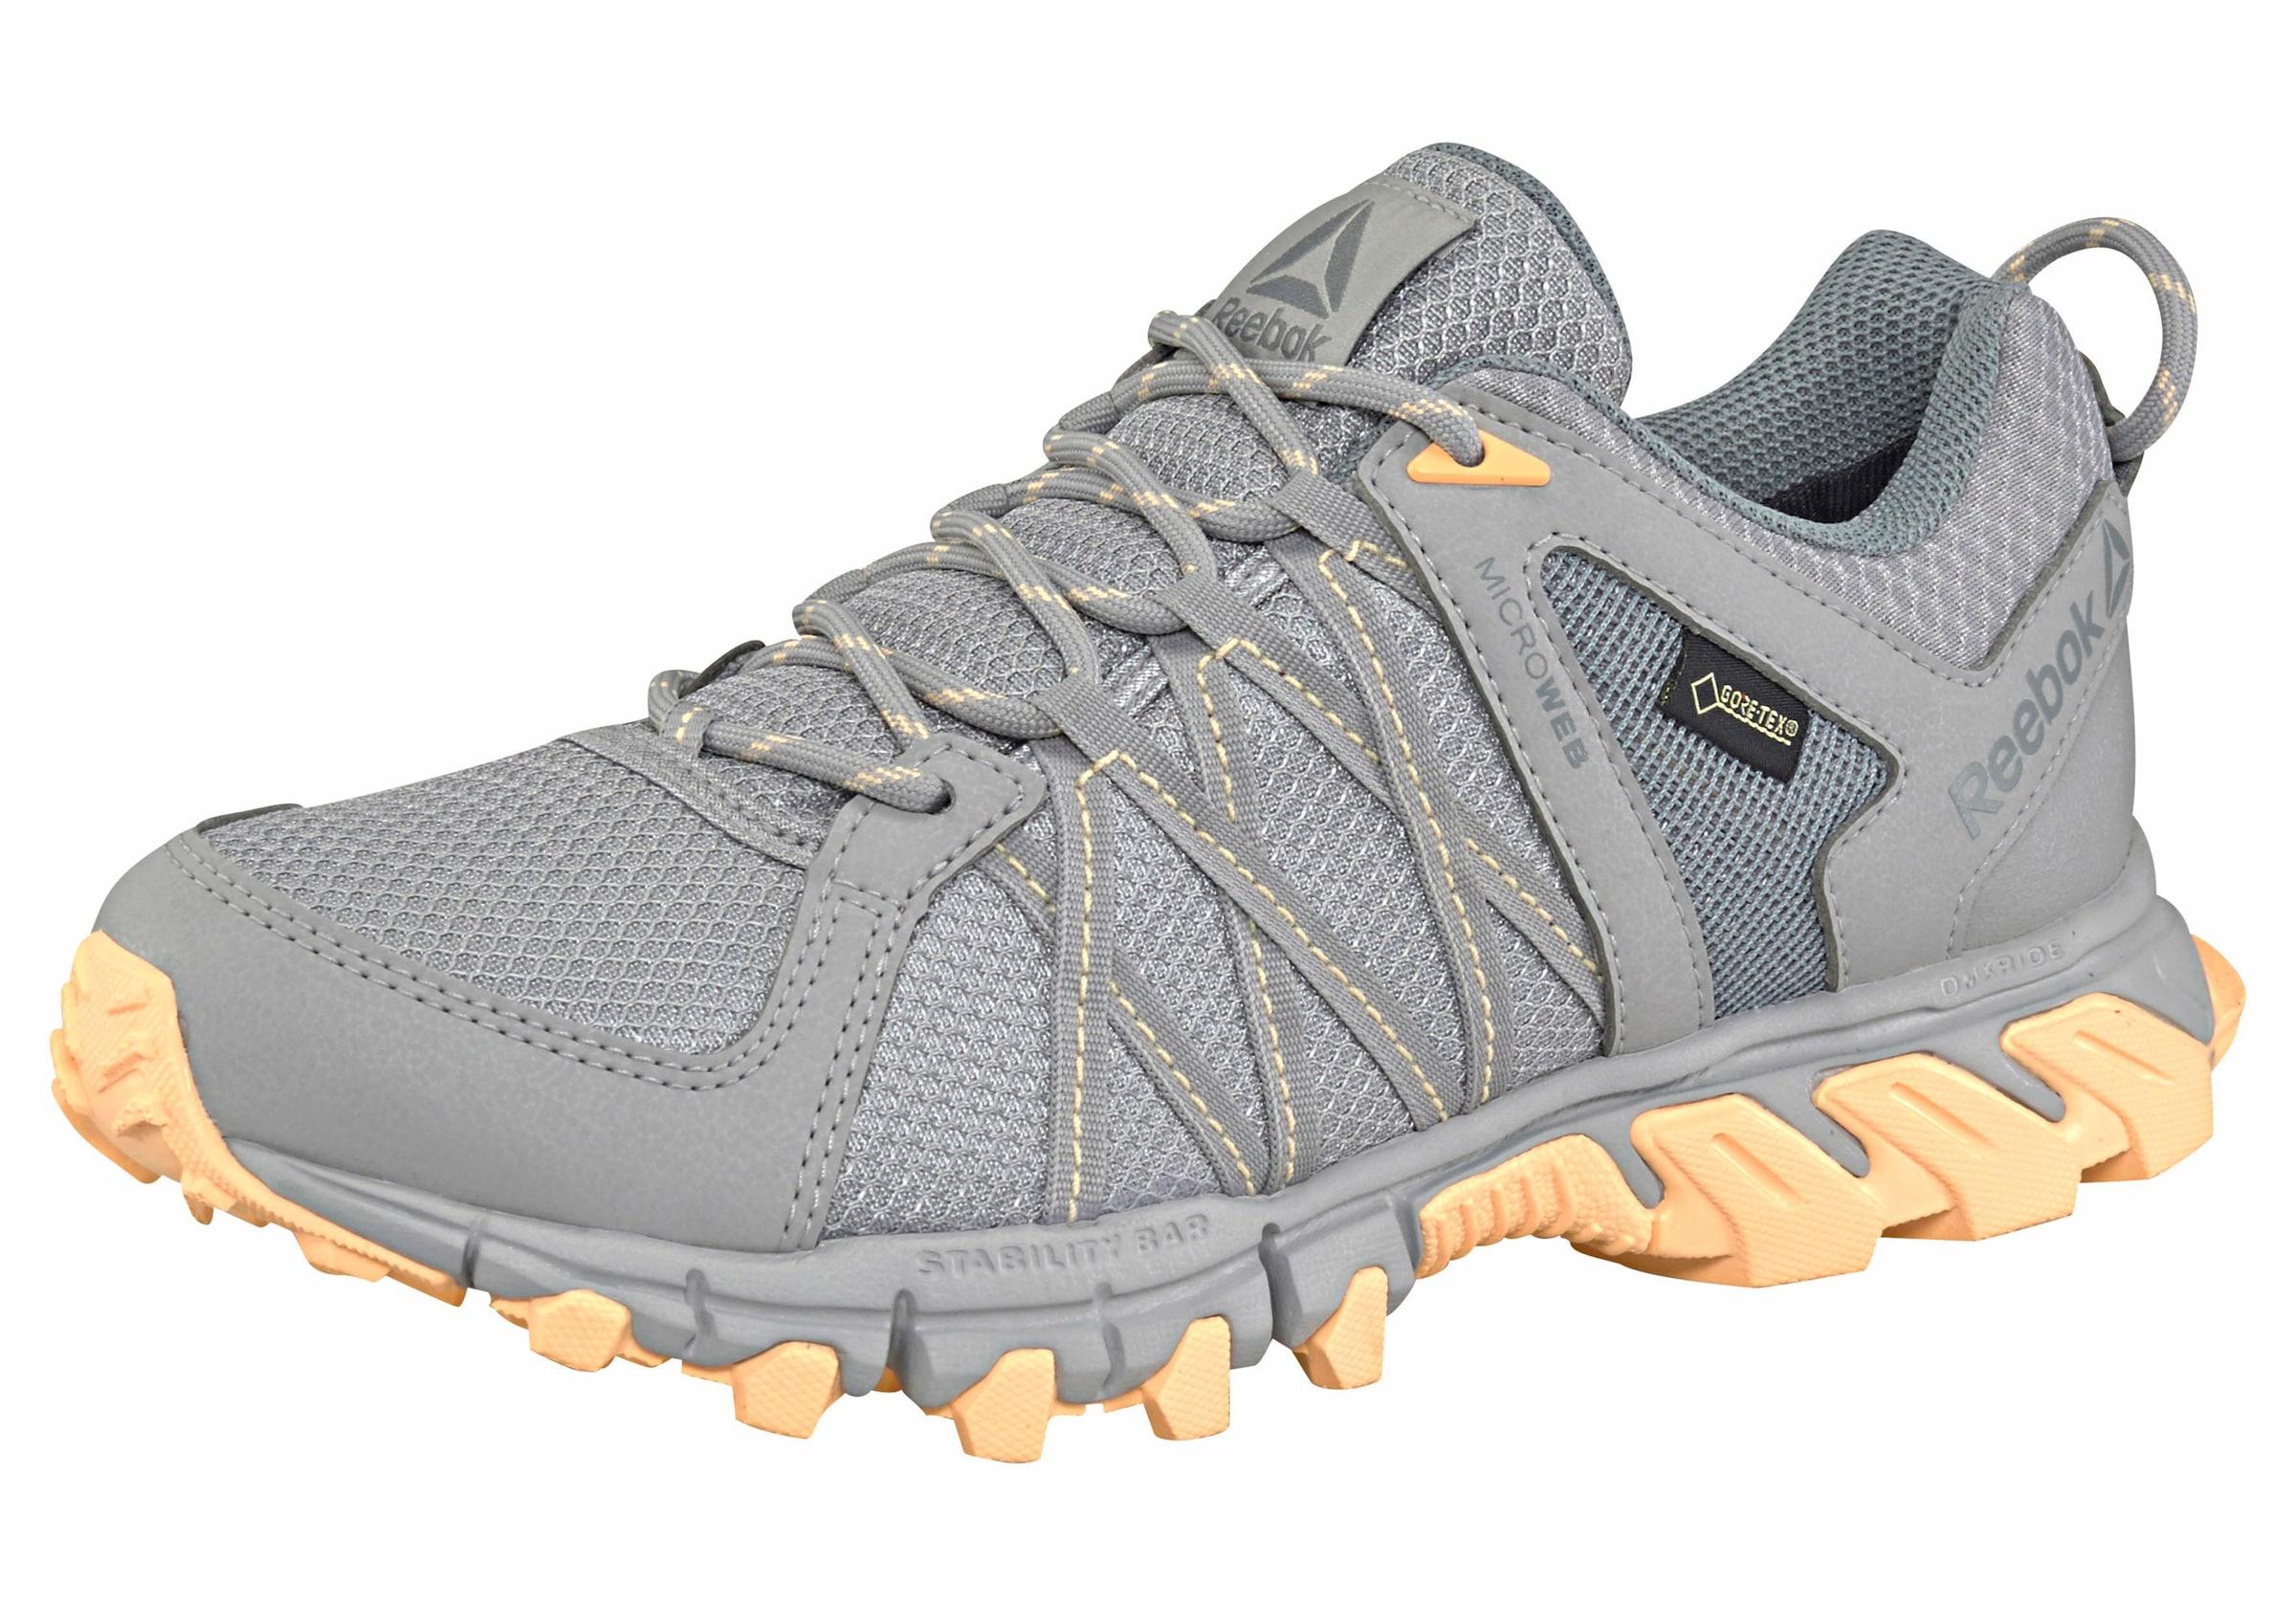 Reebok Walkingschuh »Trailgrip RS 5.0 Goretex« online kaufen